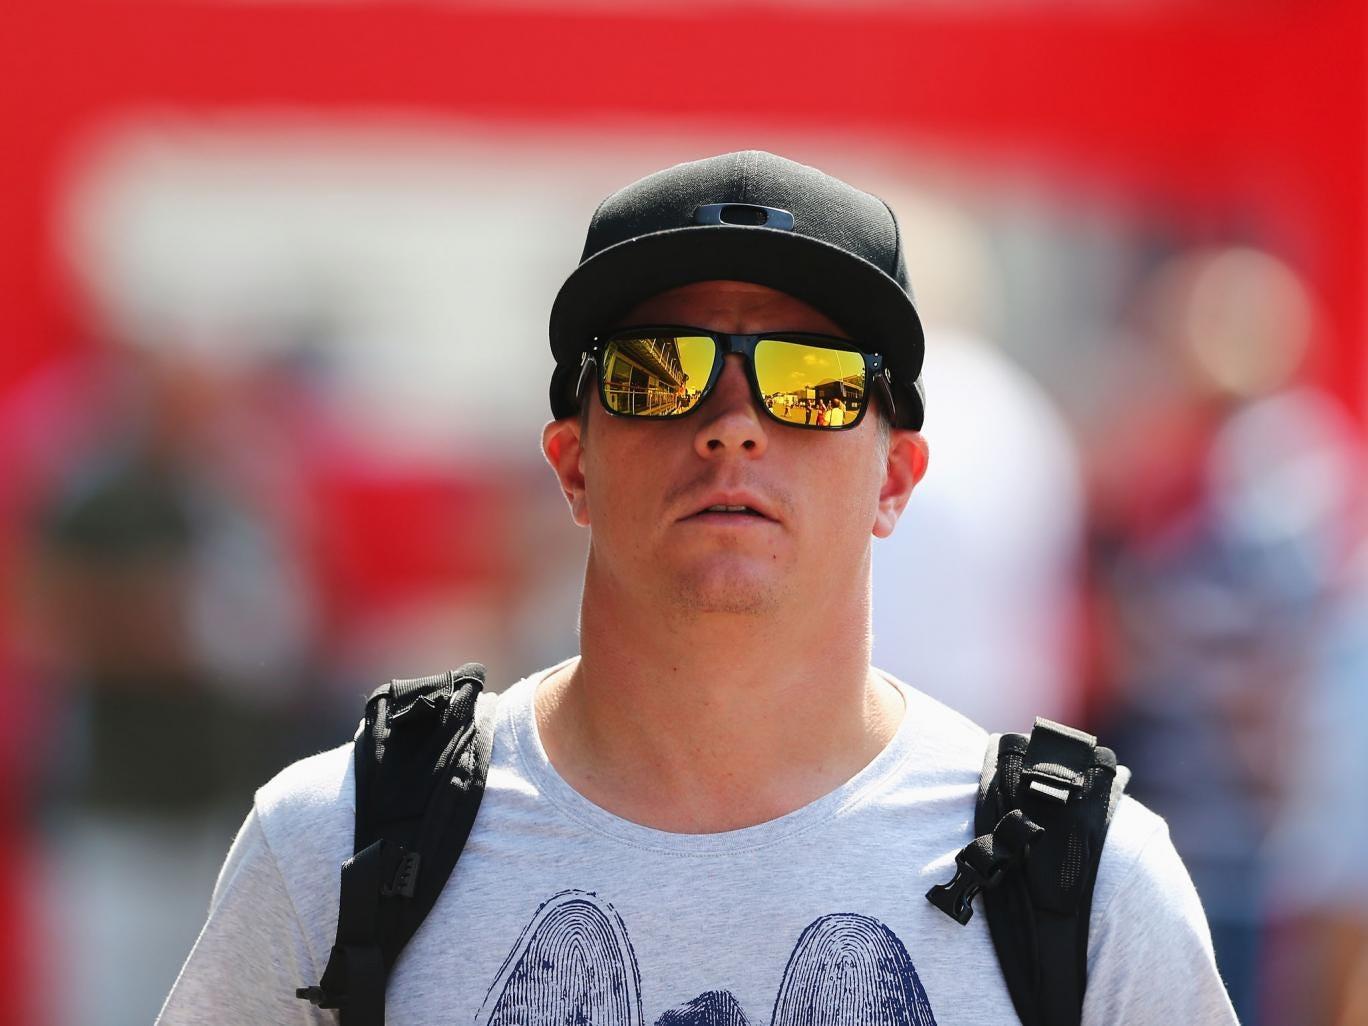 Kimi Raikkonen appears to be closing in on a return to former team Ferrari